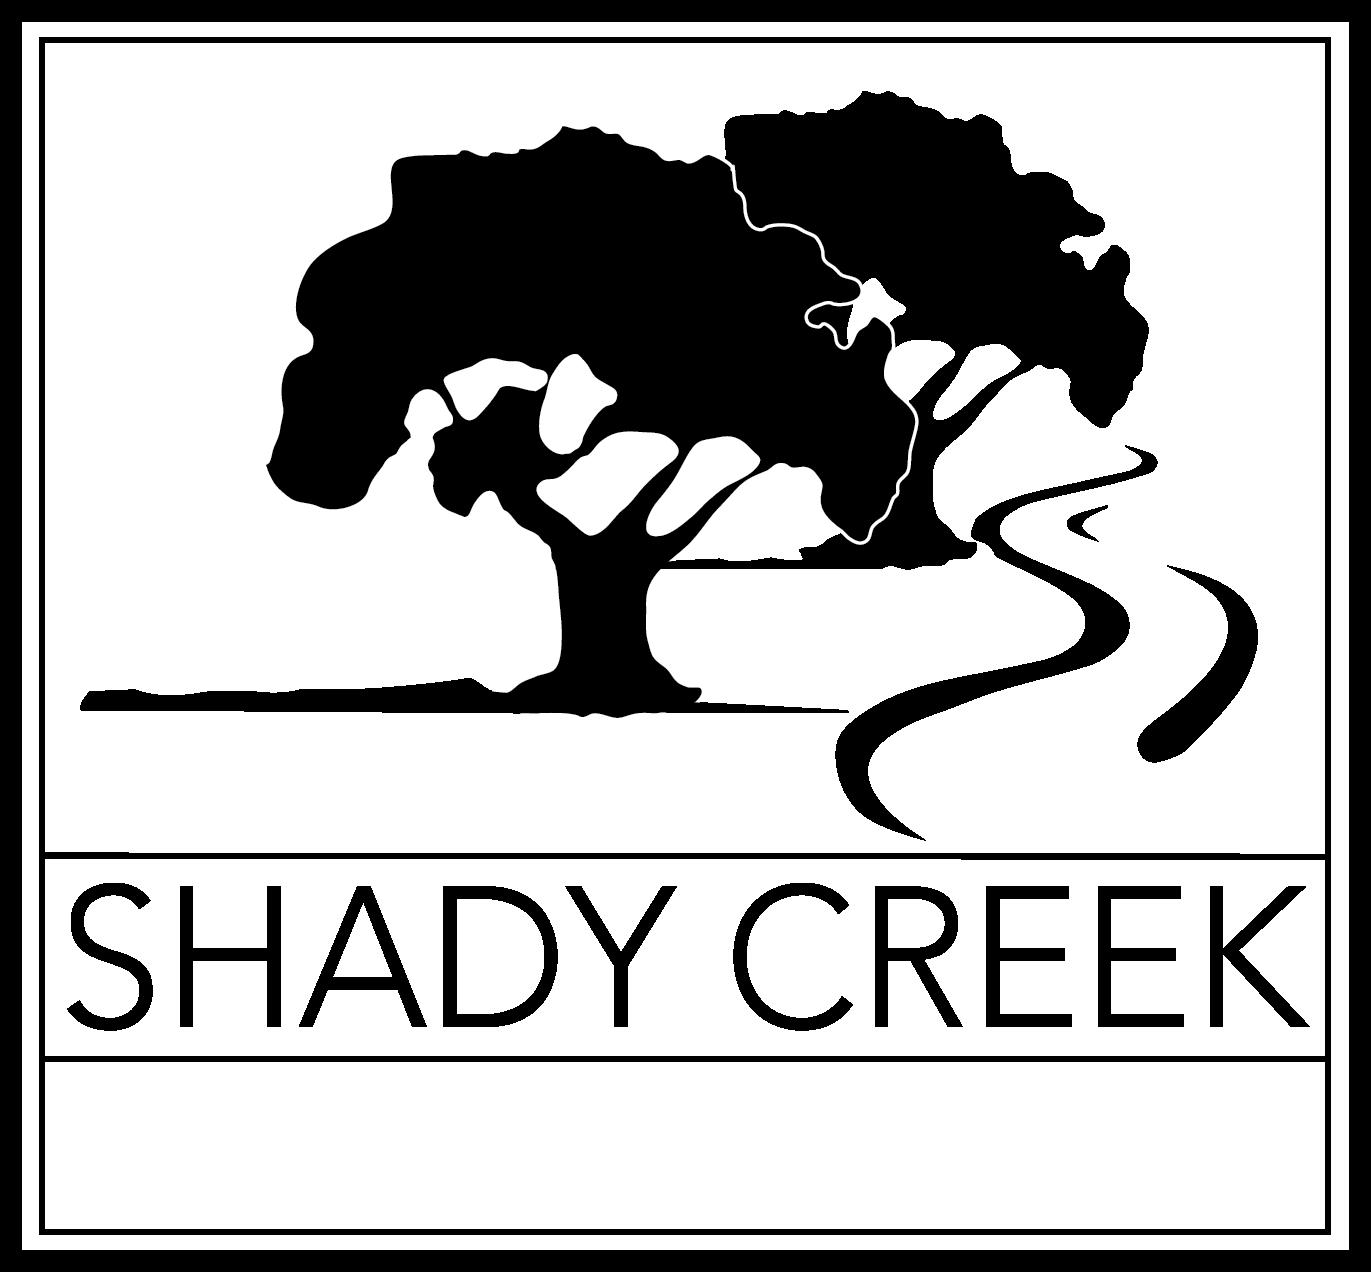 Shady Creek Texas